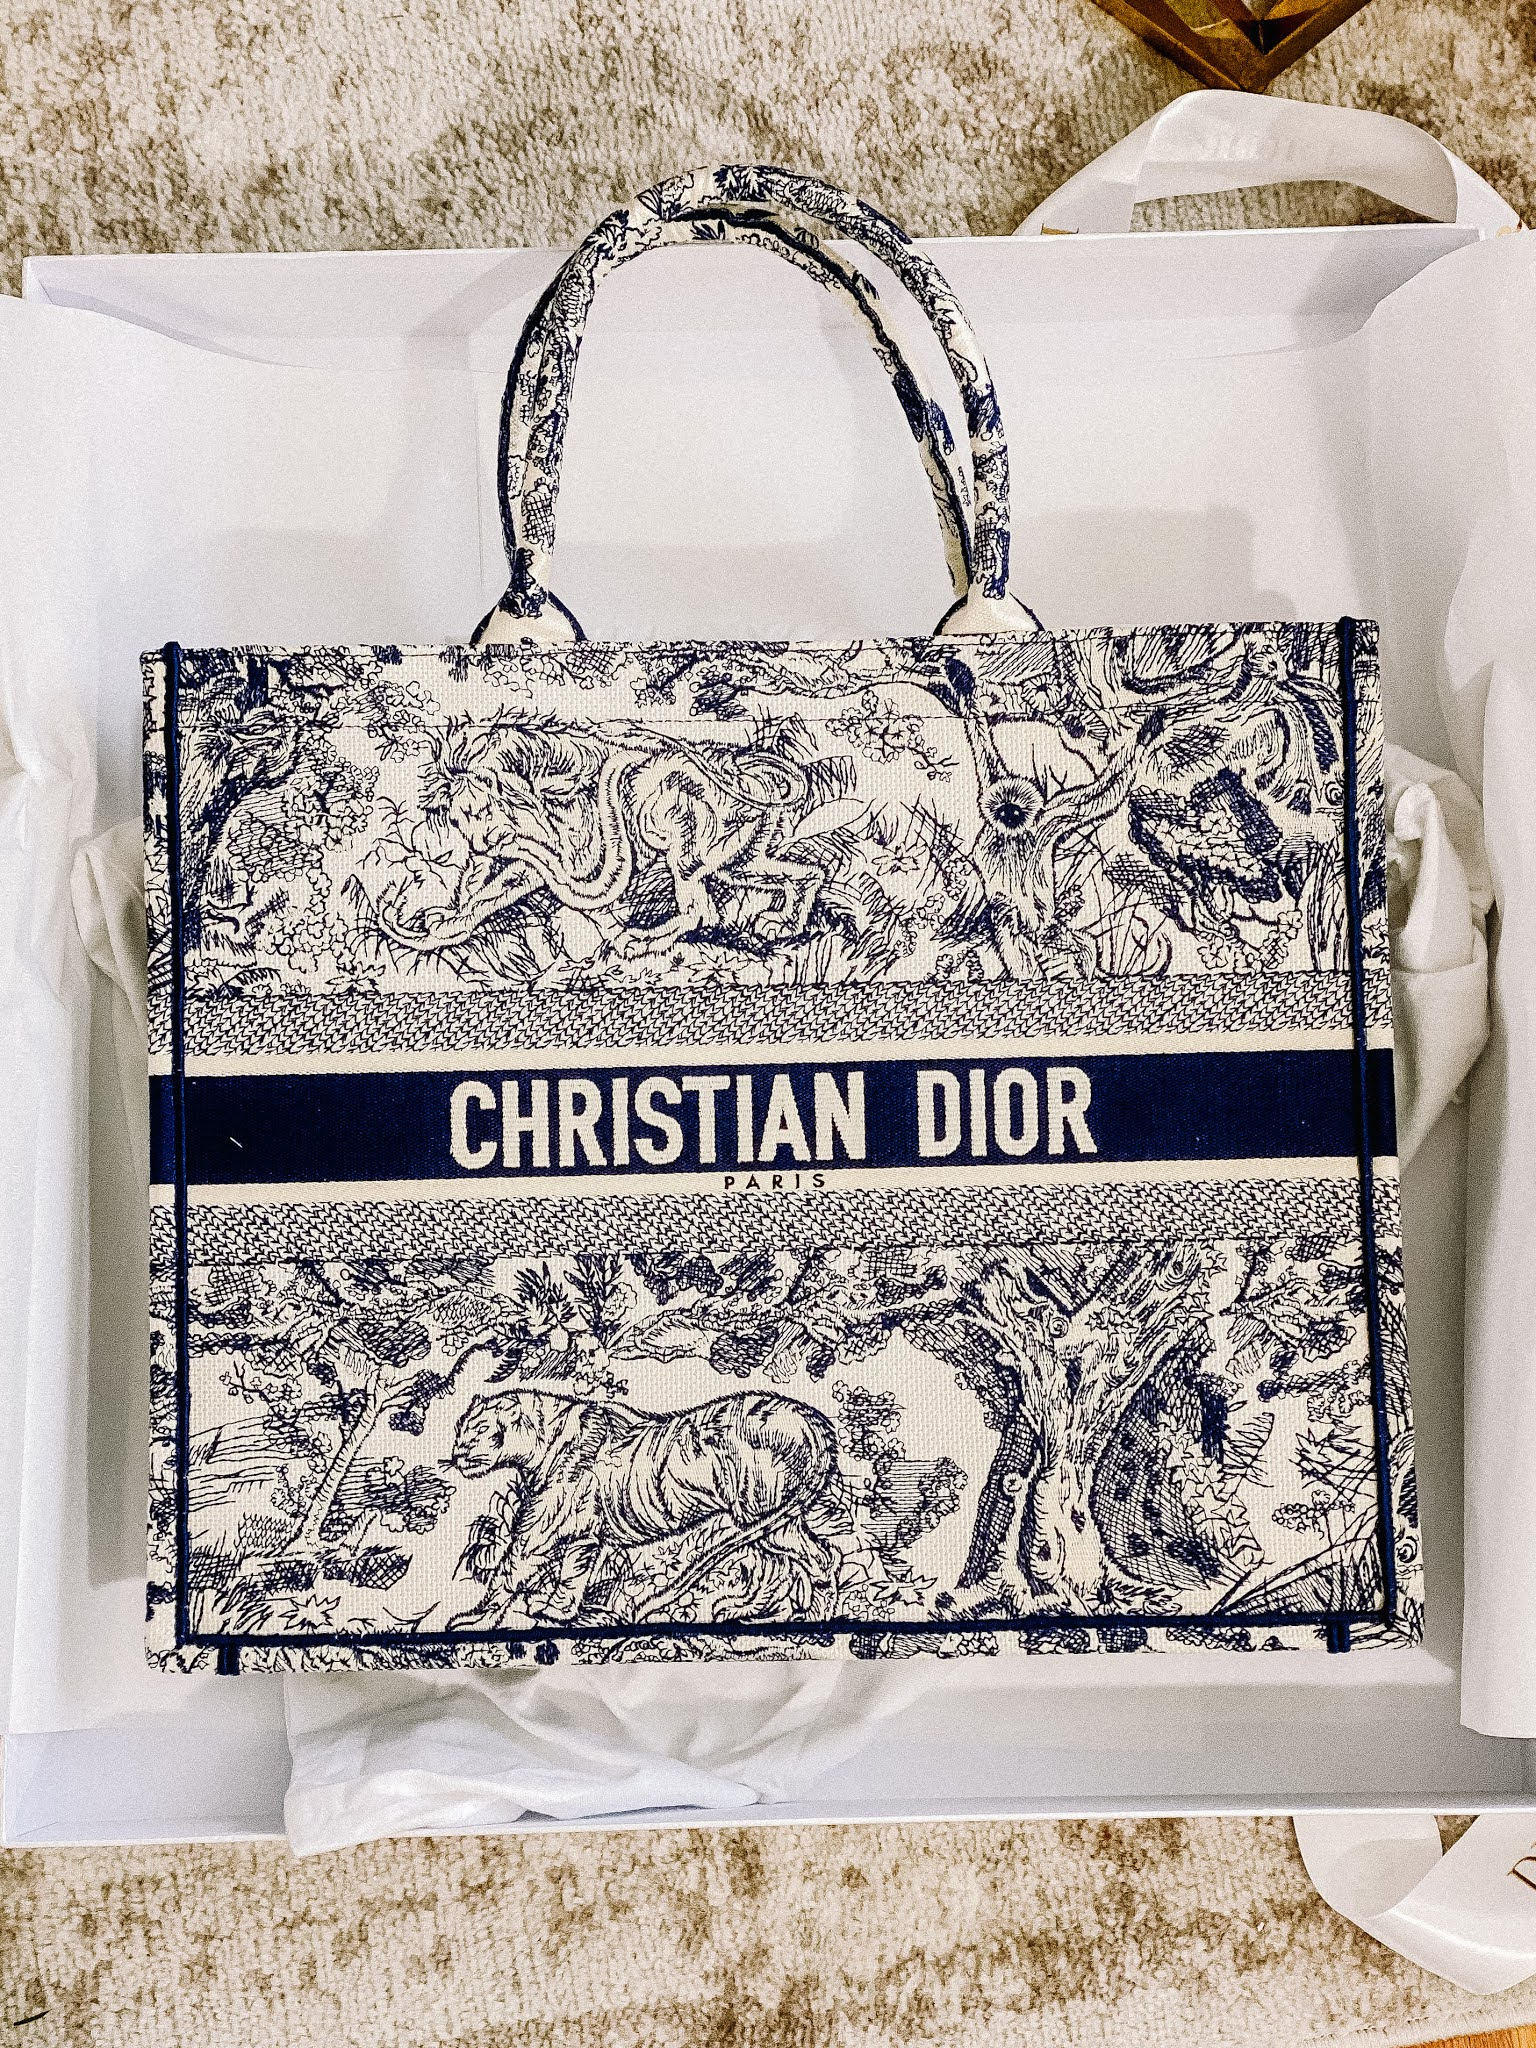 https://www.dior.com/en_us/womens-fashion/bags/dior-book-tote?a_aid=5f77305bbf34e